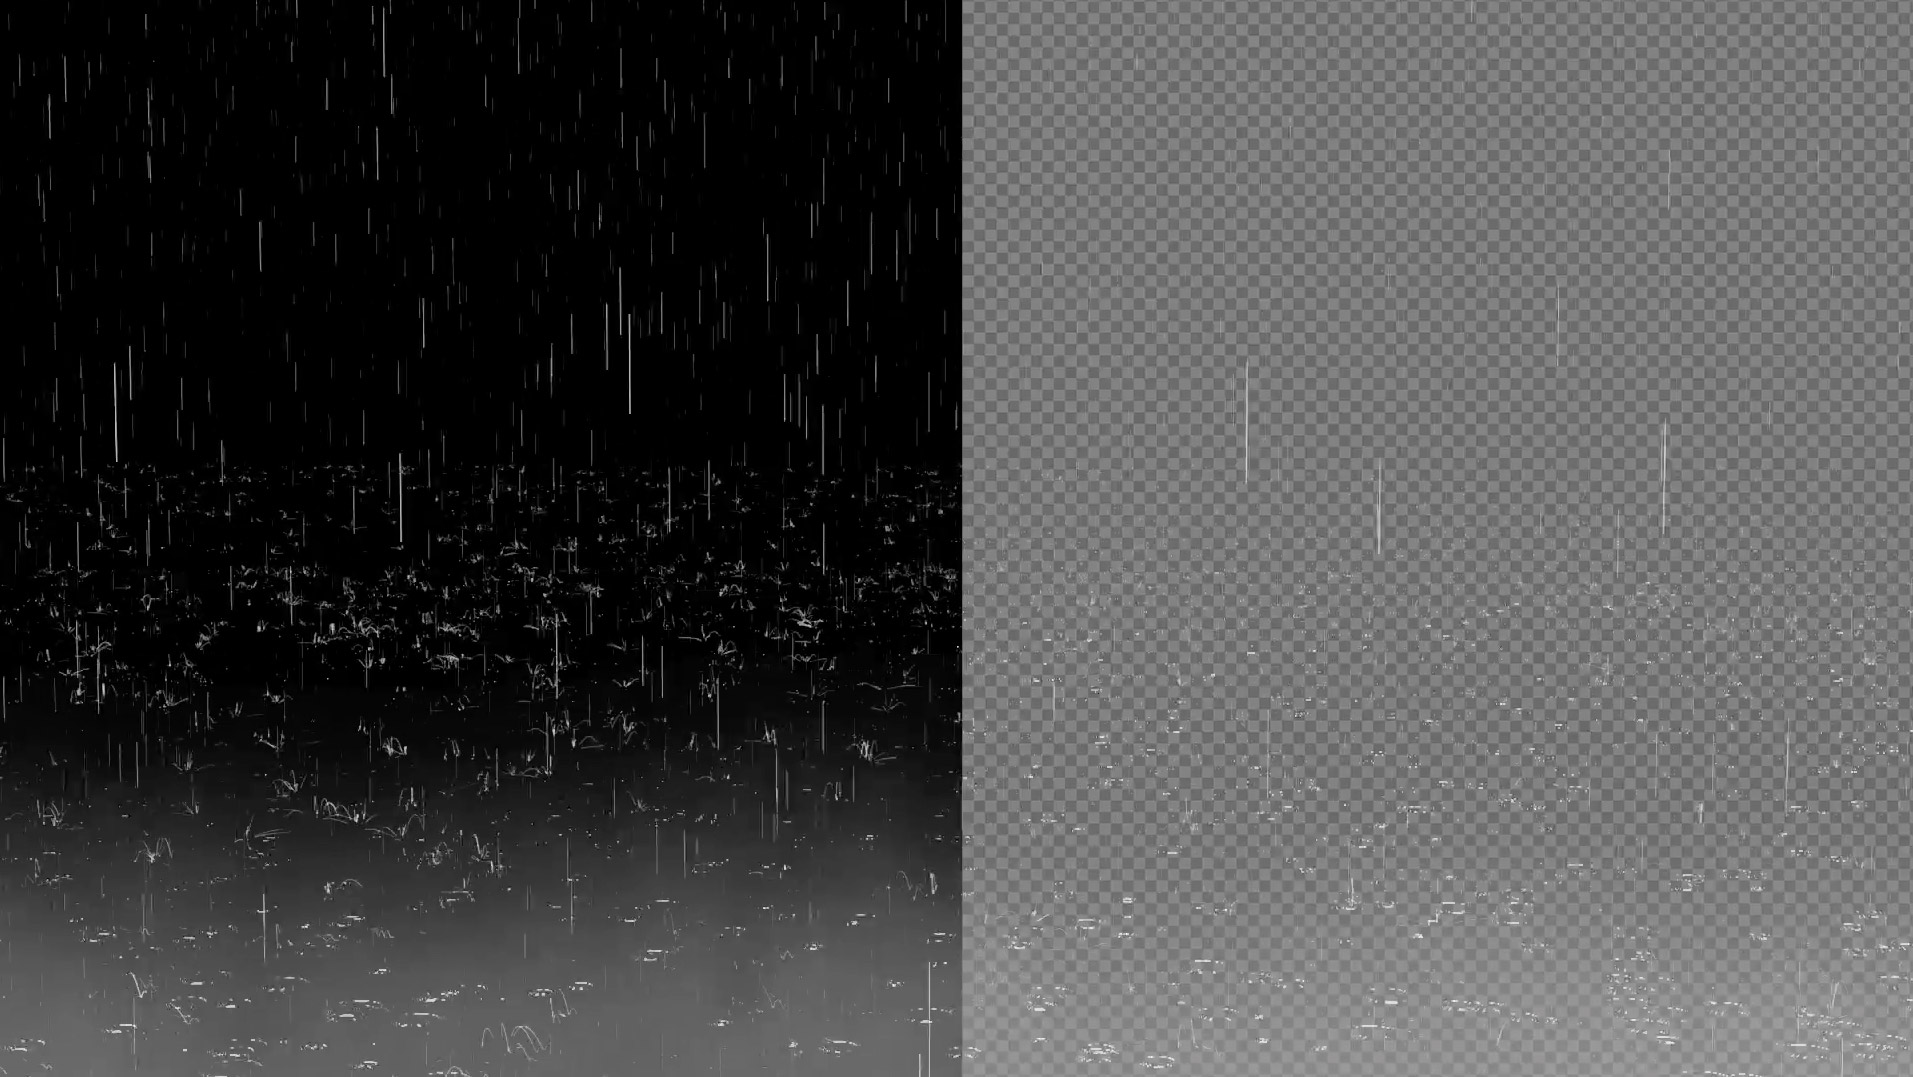 Rain or Real Rain effect